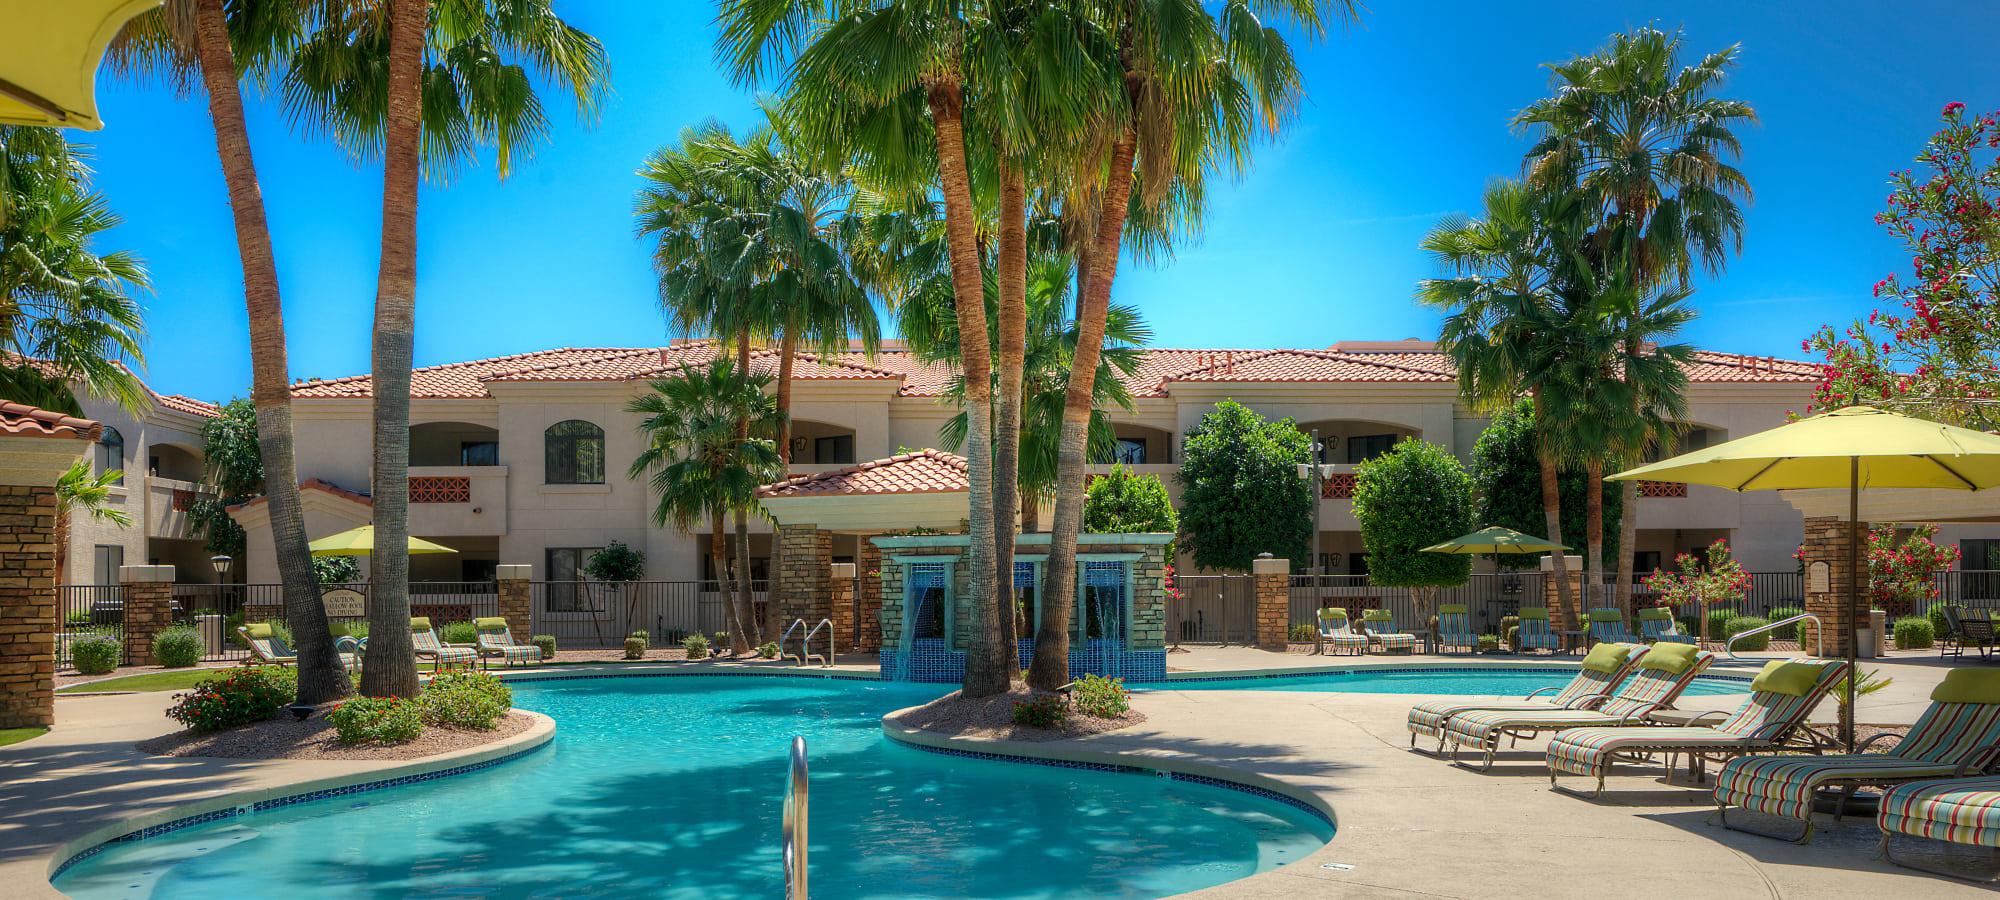 Swimming pool and sundeck at San Prado in Glendale, Arizona